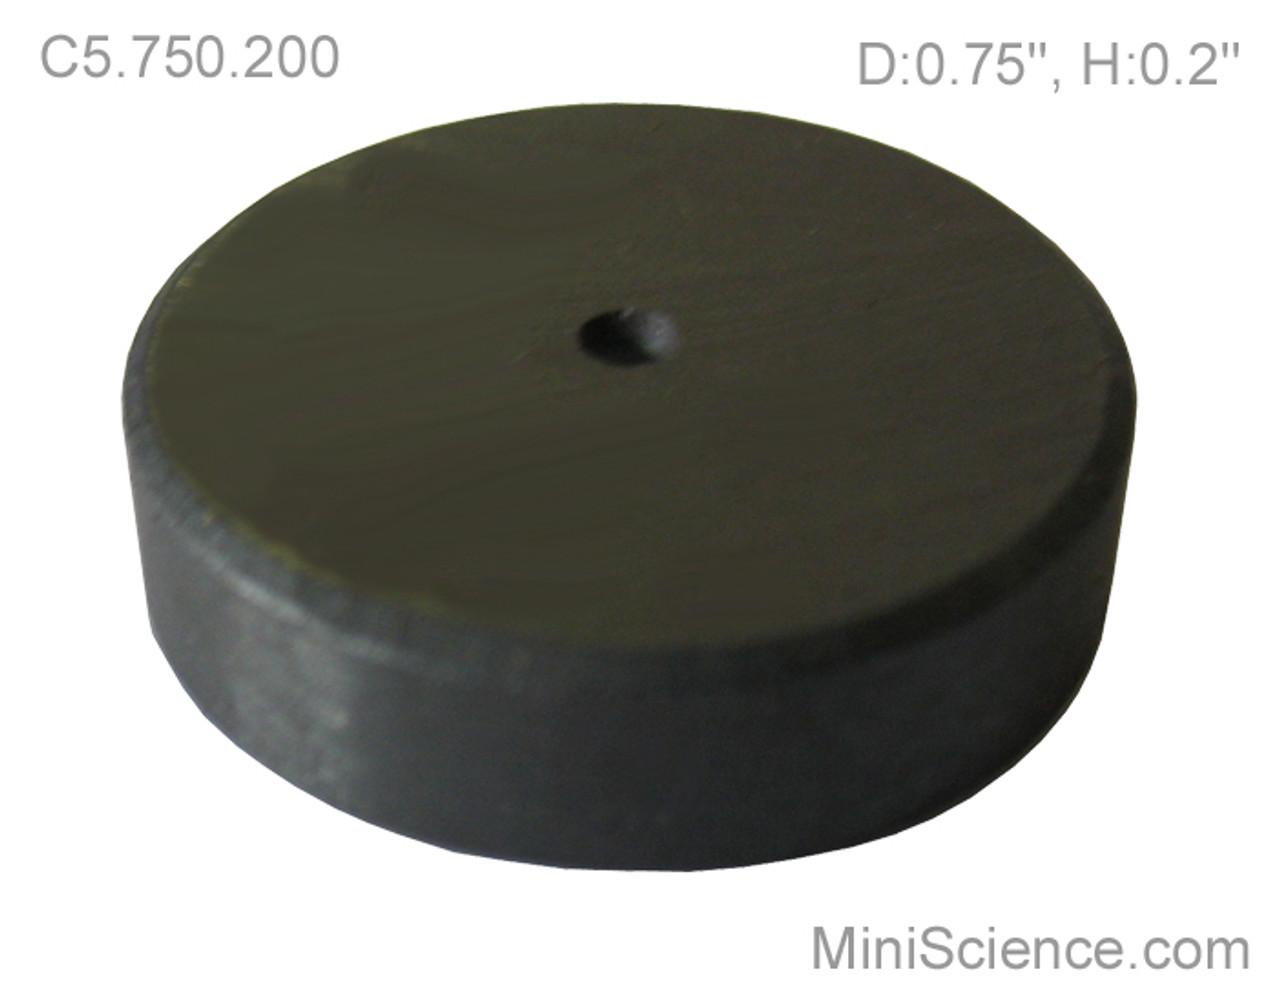 Ceramic Disk Magnet, 3/4 inch diameter, Wholesale